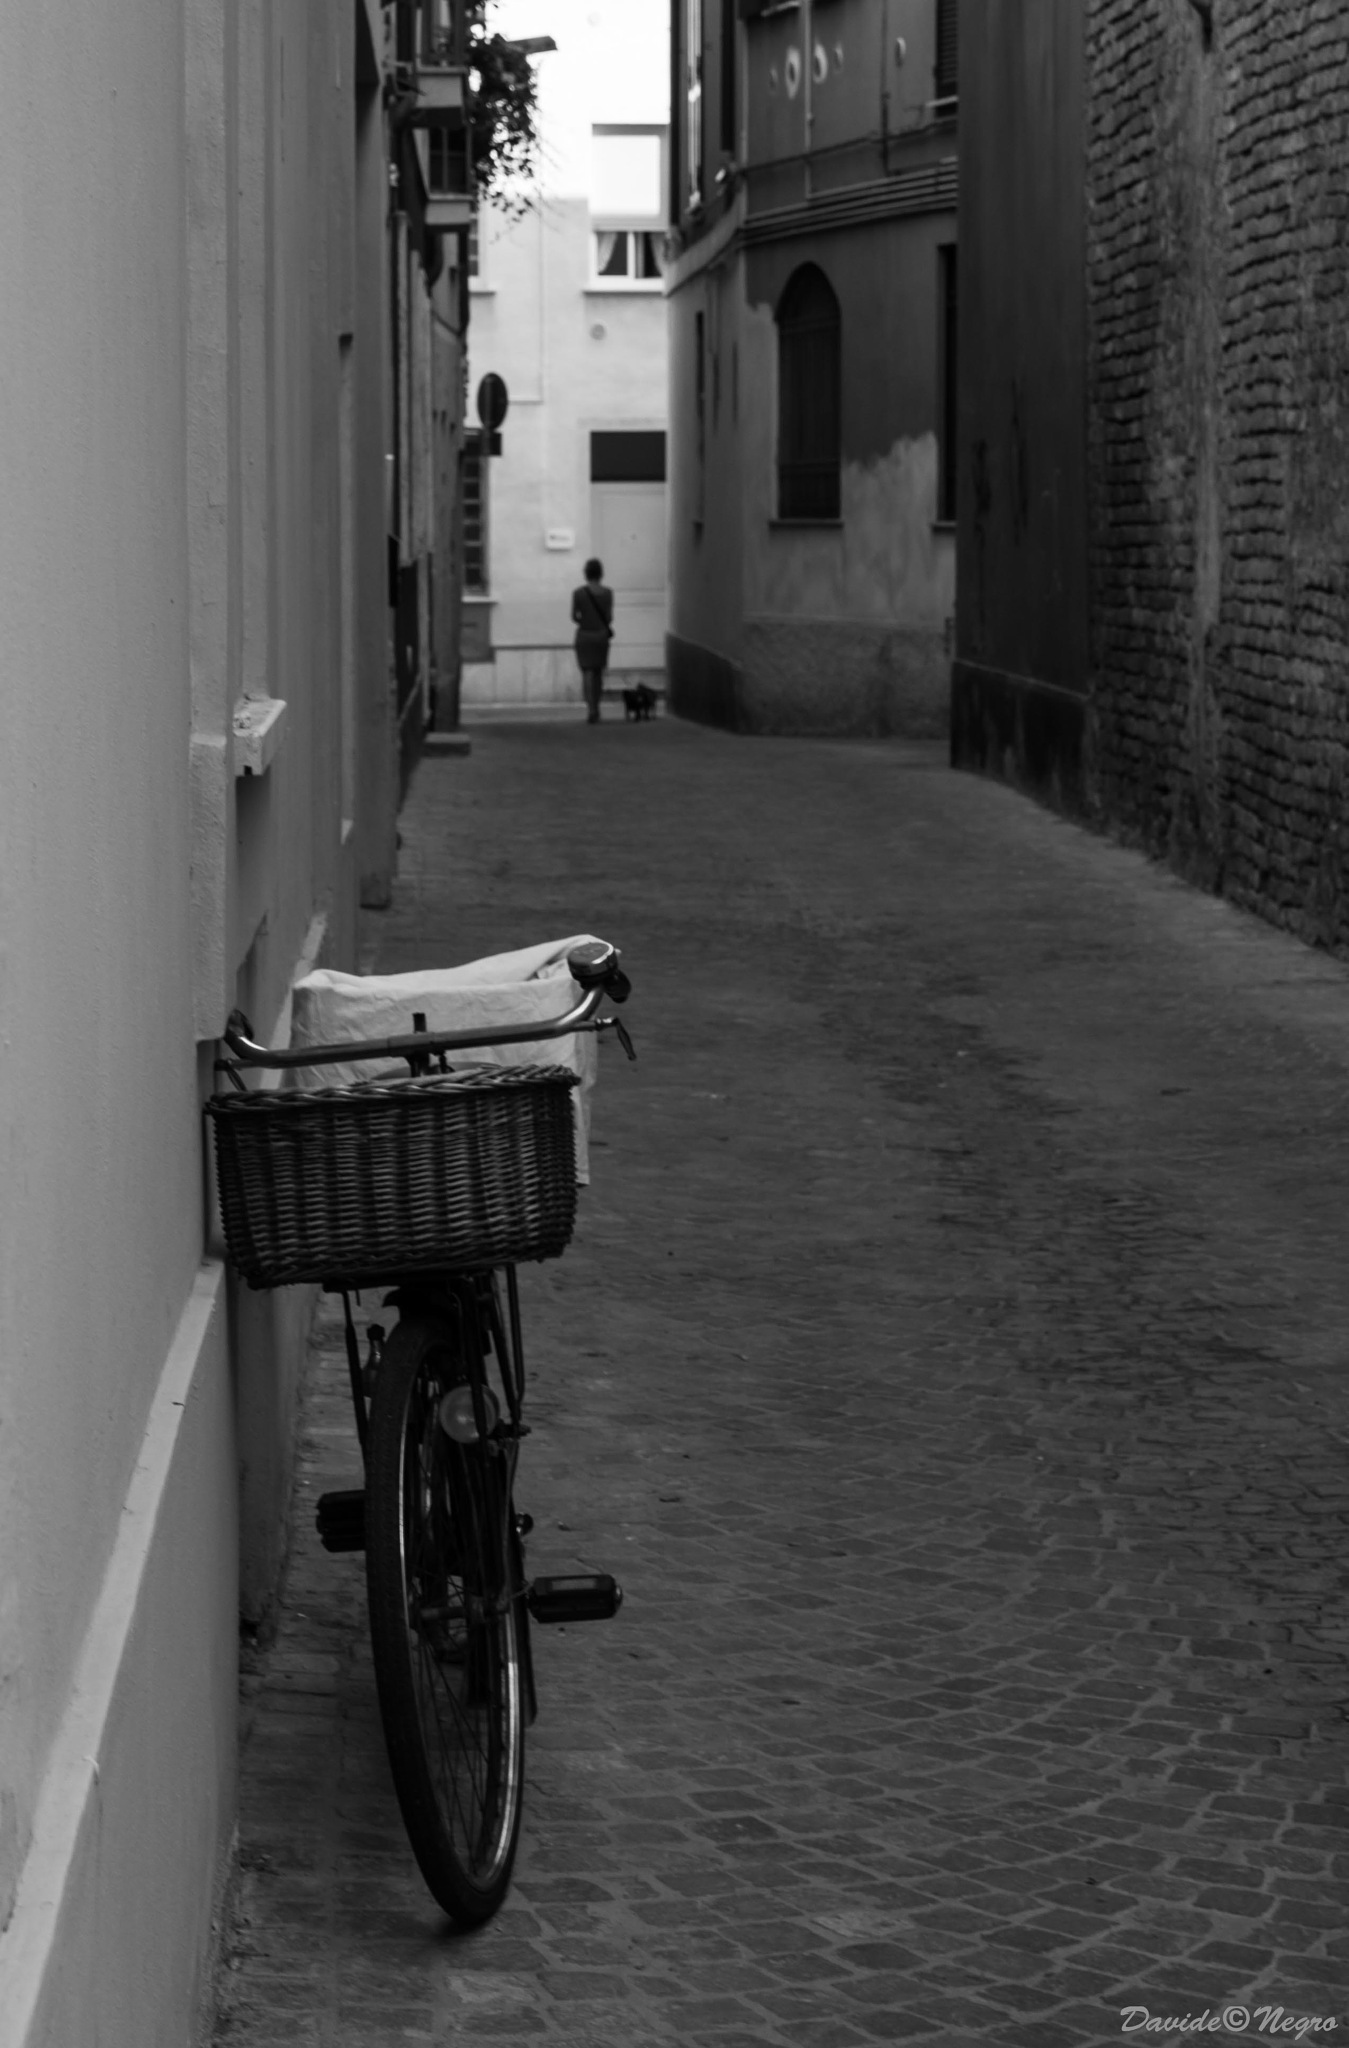 bici by DavideNegro